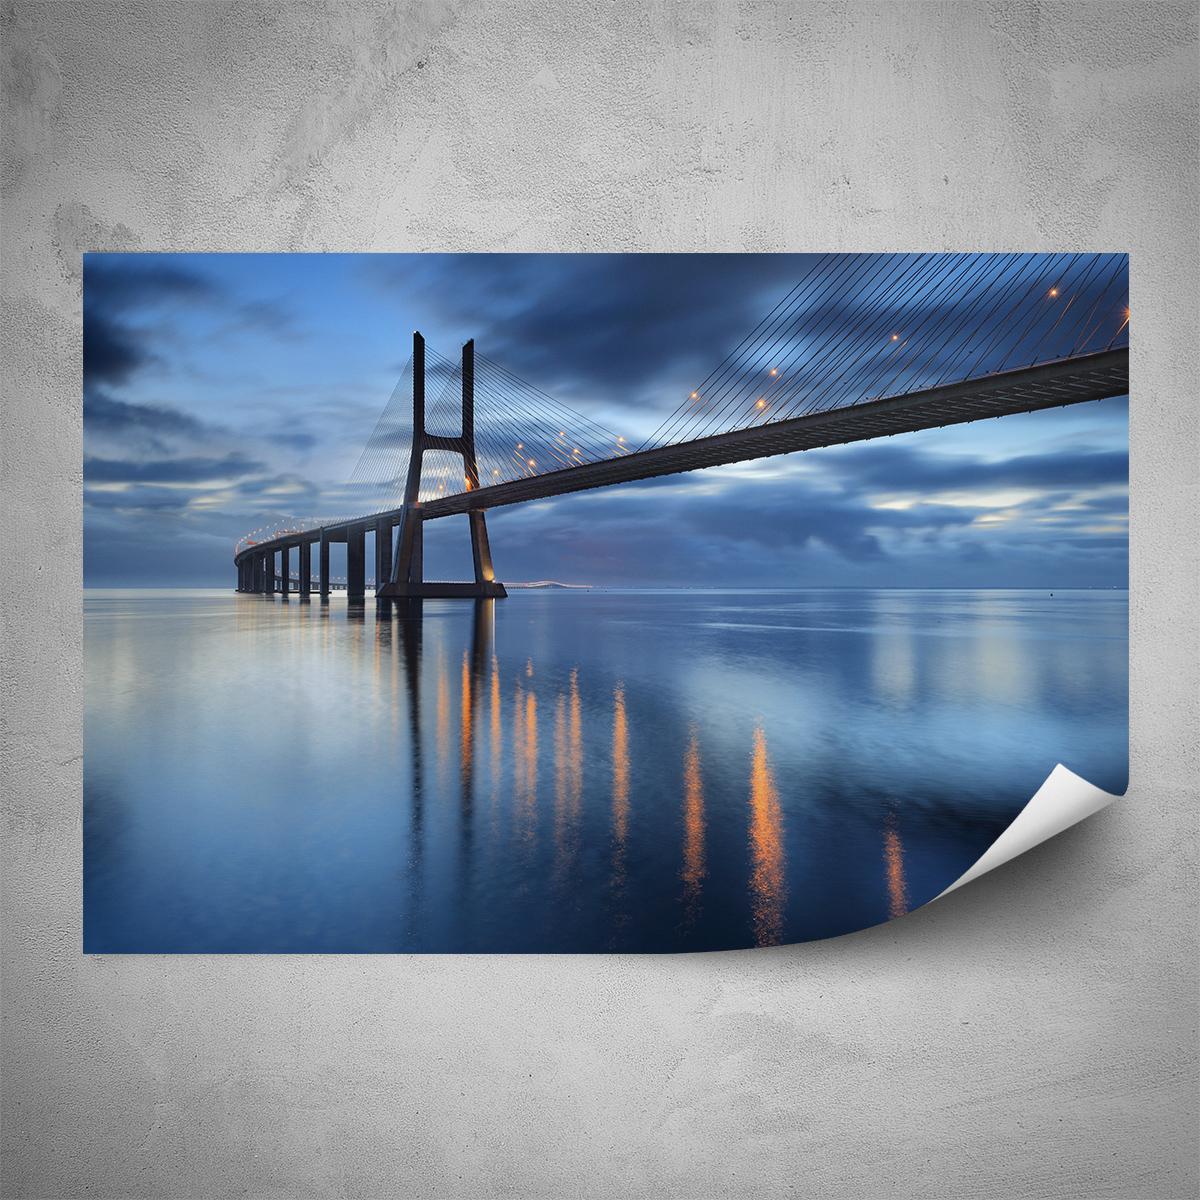 Plakát - Most Vasco da Gama - 60x40 cm - PopyDesign